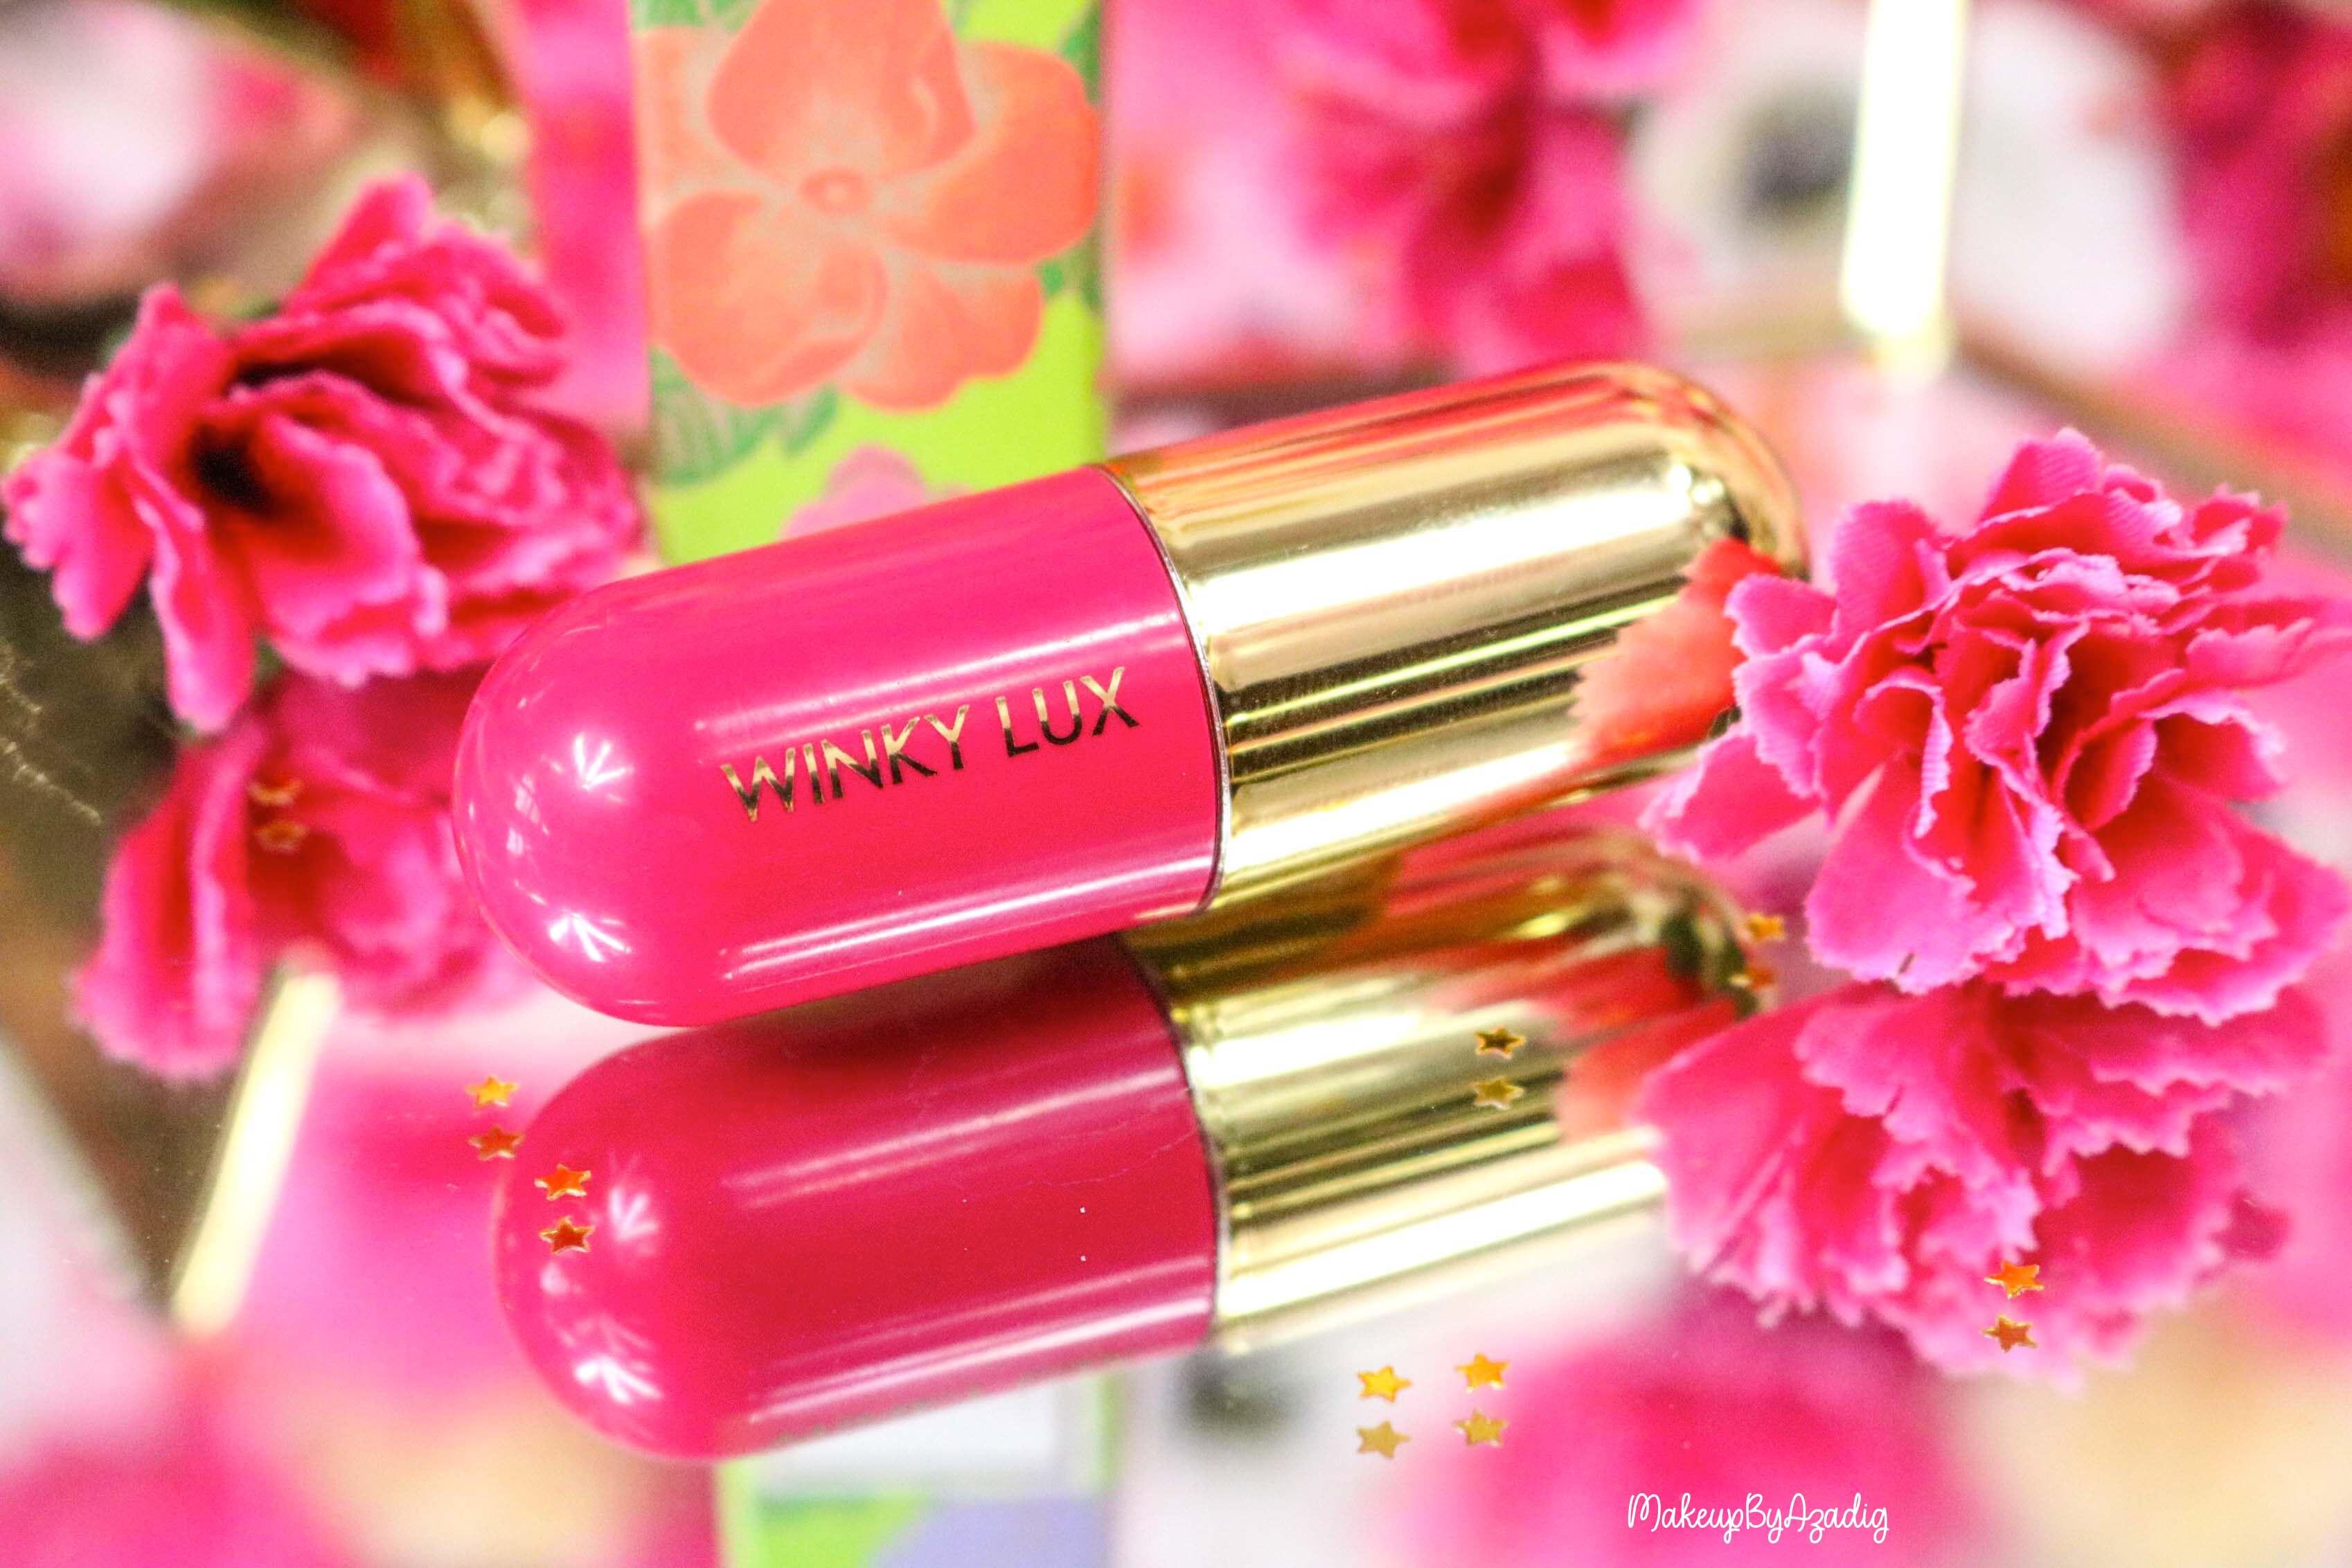 revue-flower-balm-baume-levres-winky-lux-sephora-rose-avis-prix-makeupbyazadig-pilule